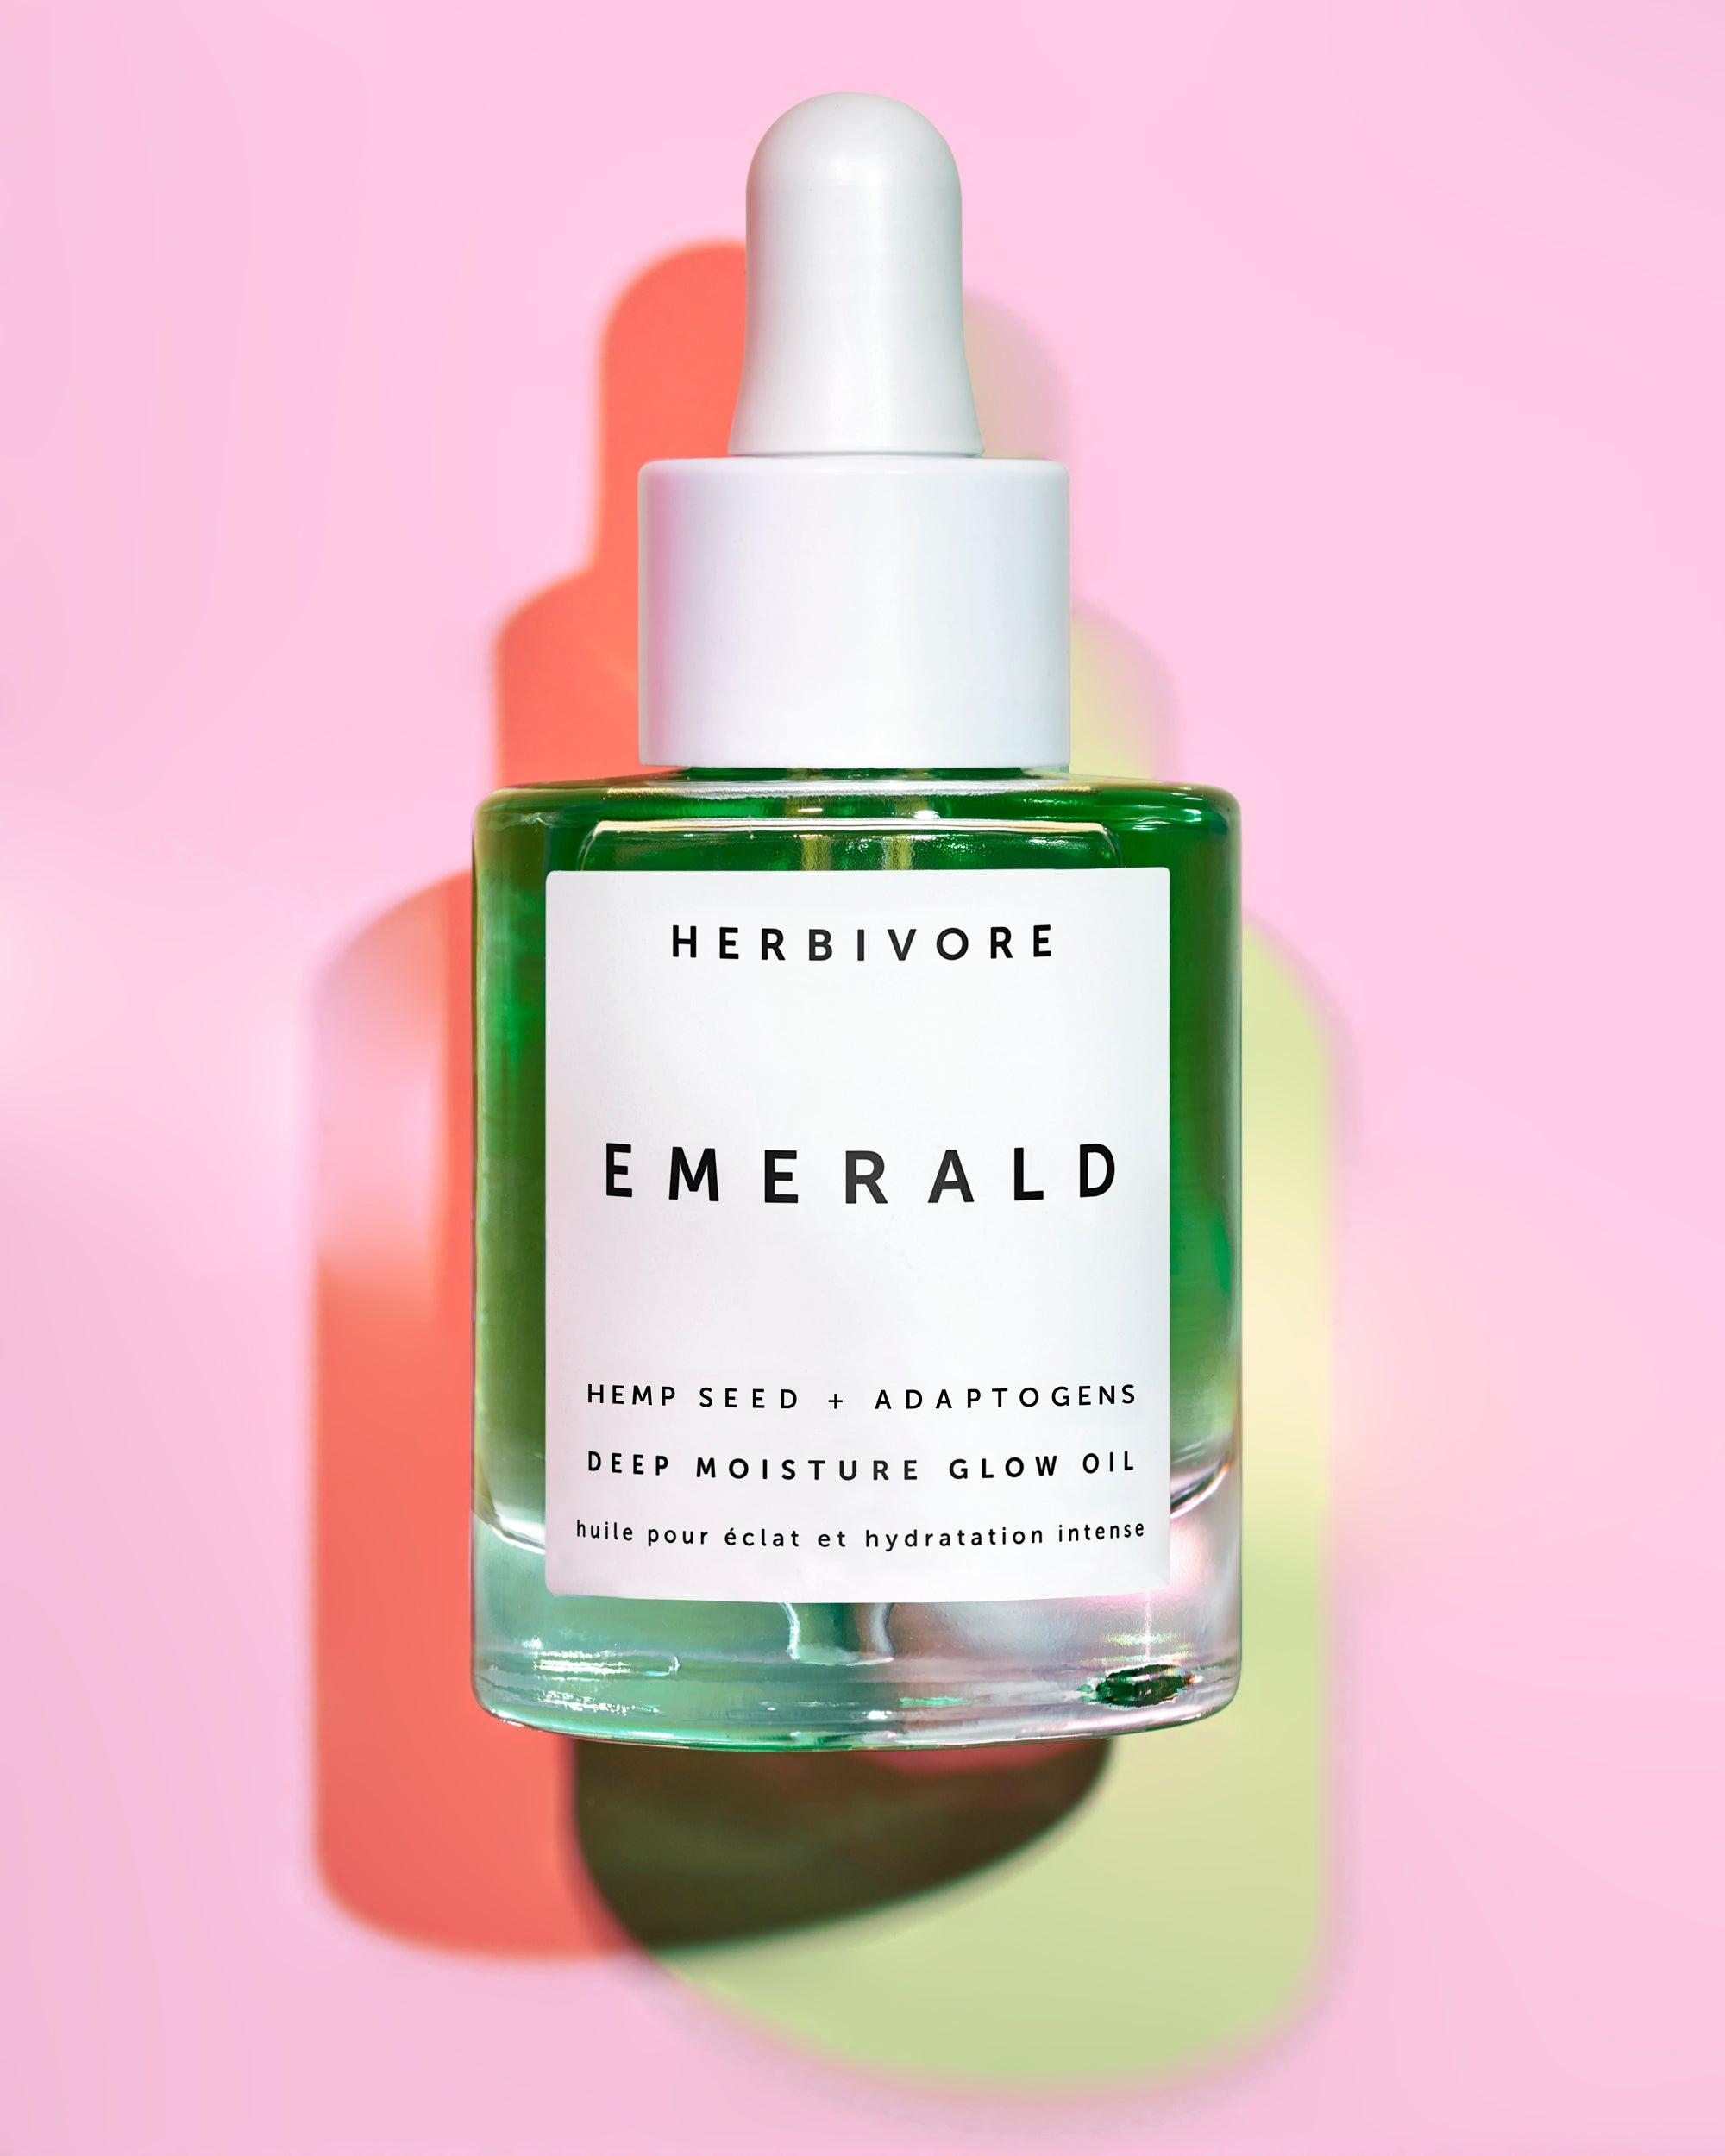 Herbivore Botanicals - Emerald, Deep Moisture Glow Oil